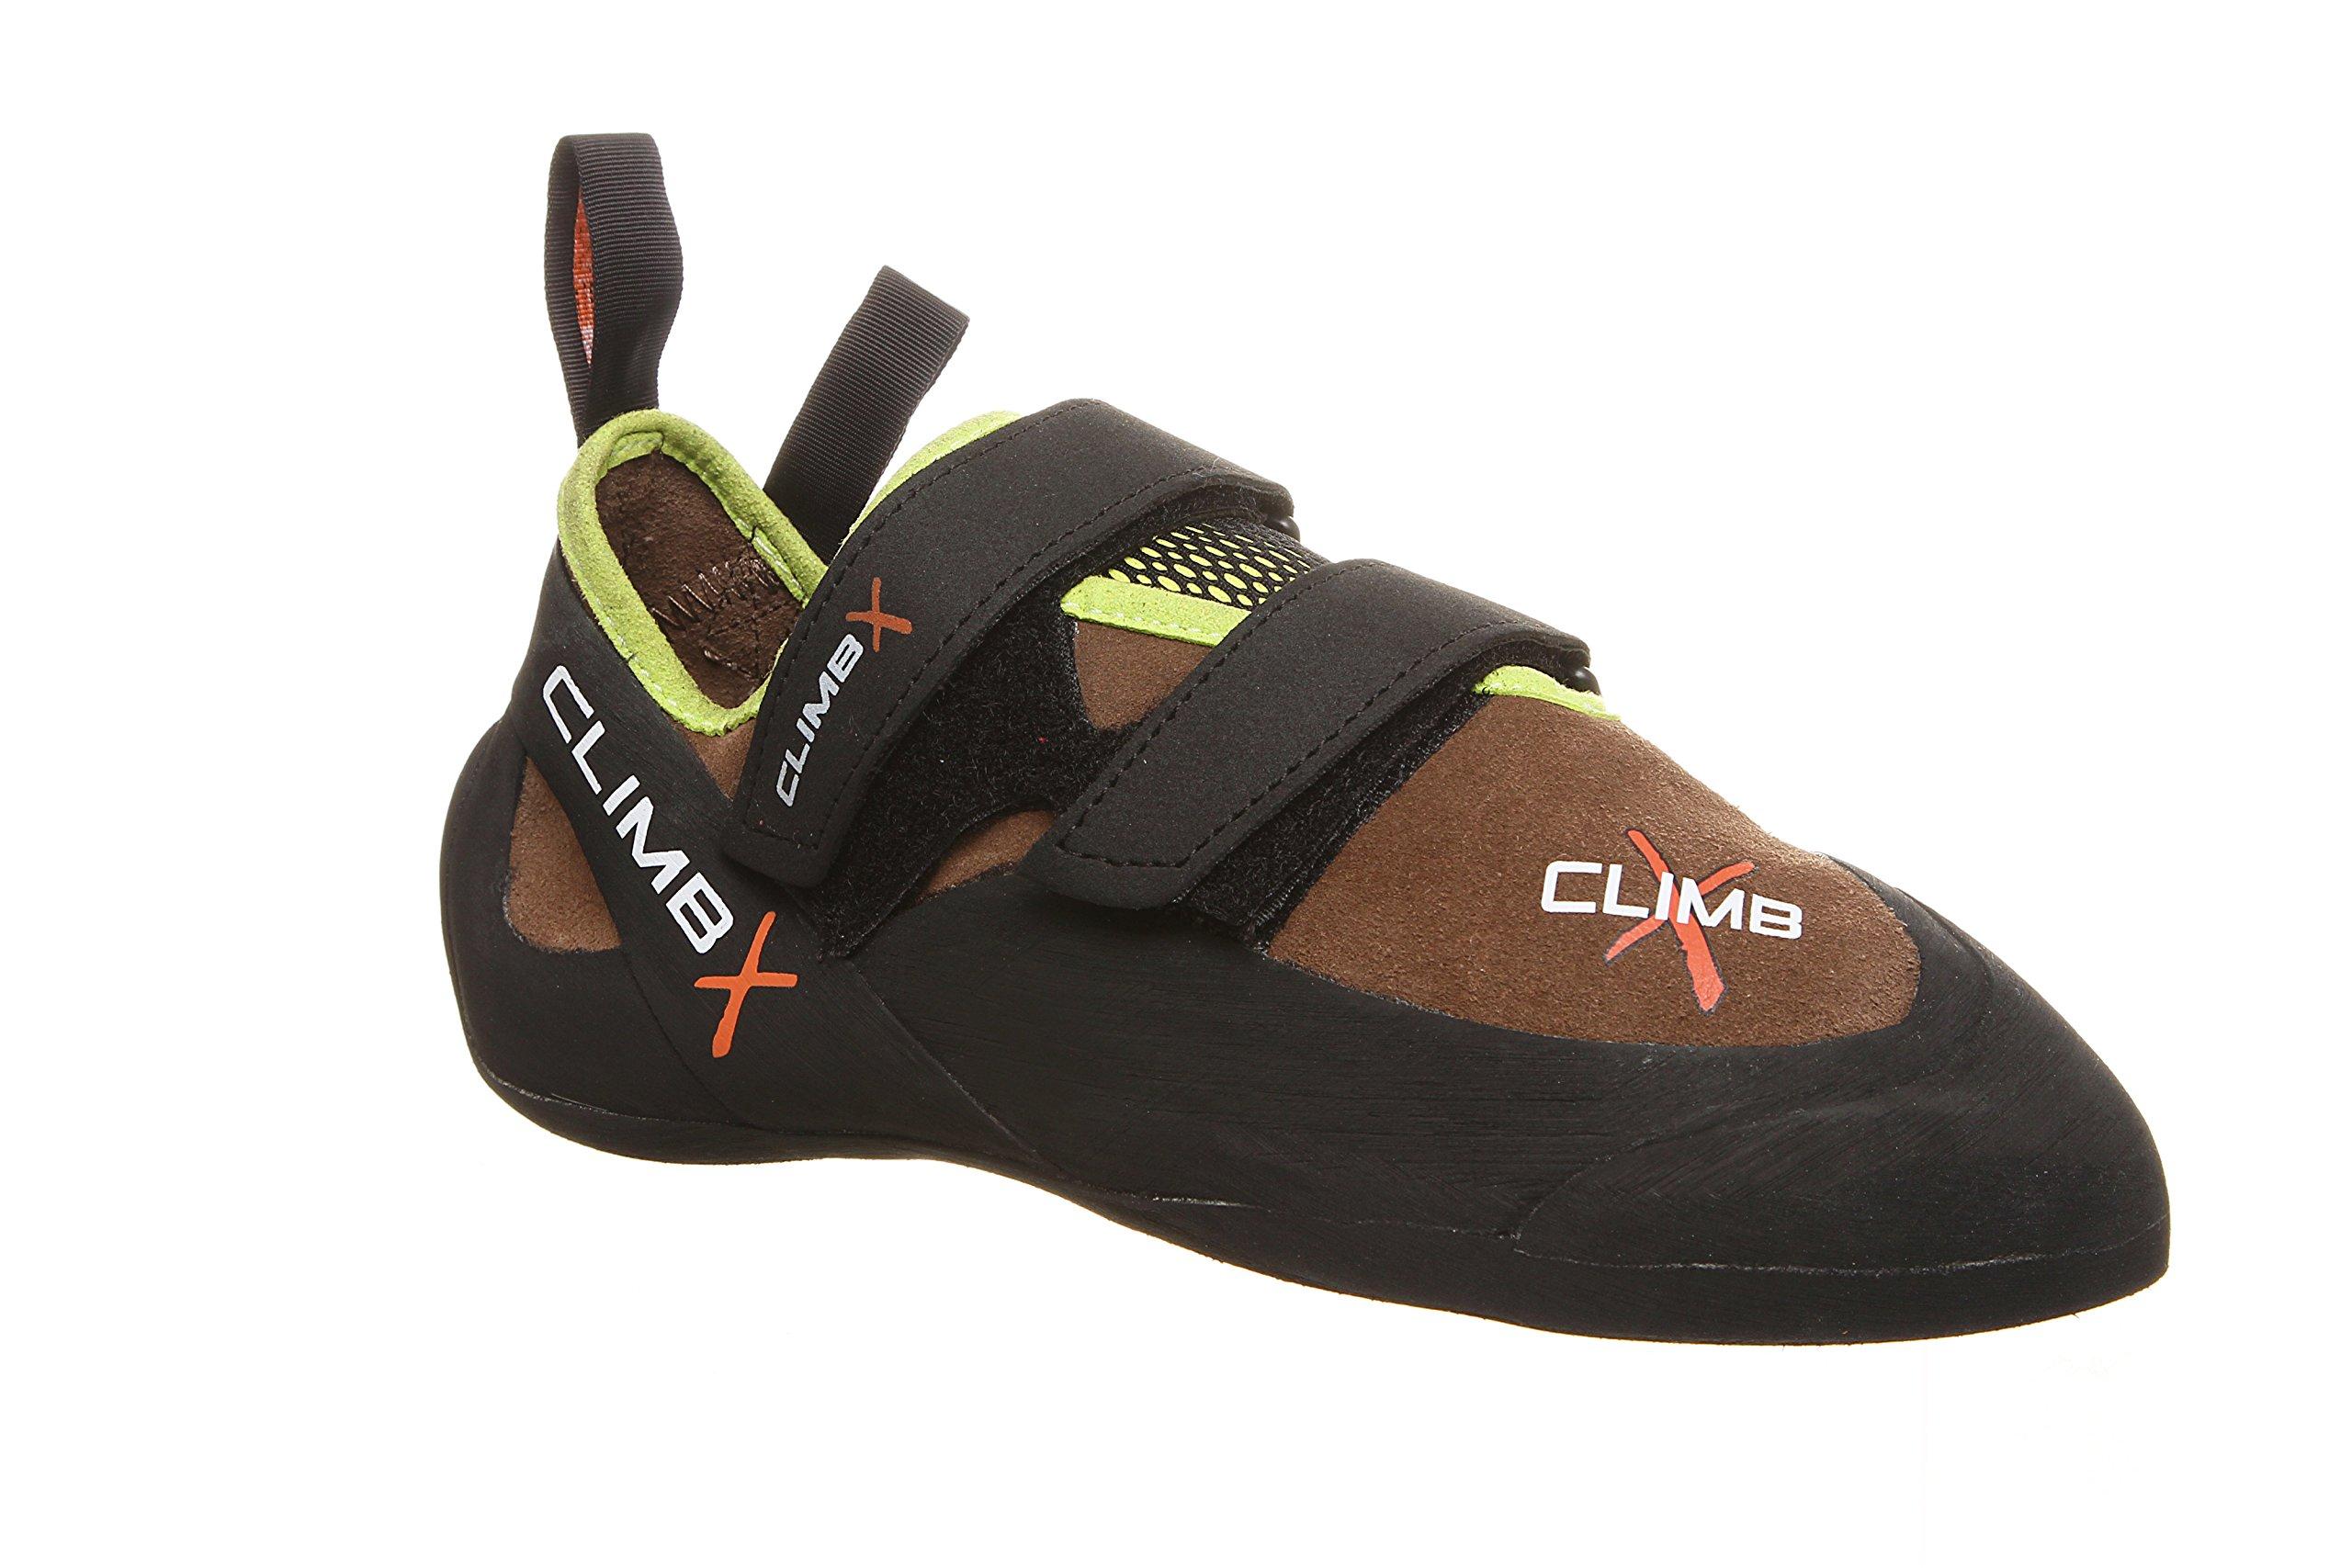 Climb X Rave Trainer Climbing Shoe with Free Sickle M-16 Climbing Brush (Men's 4, Chocolate)